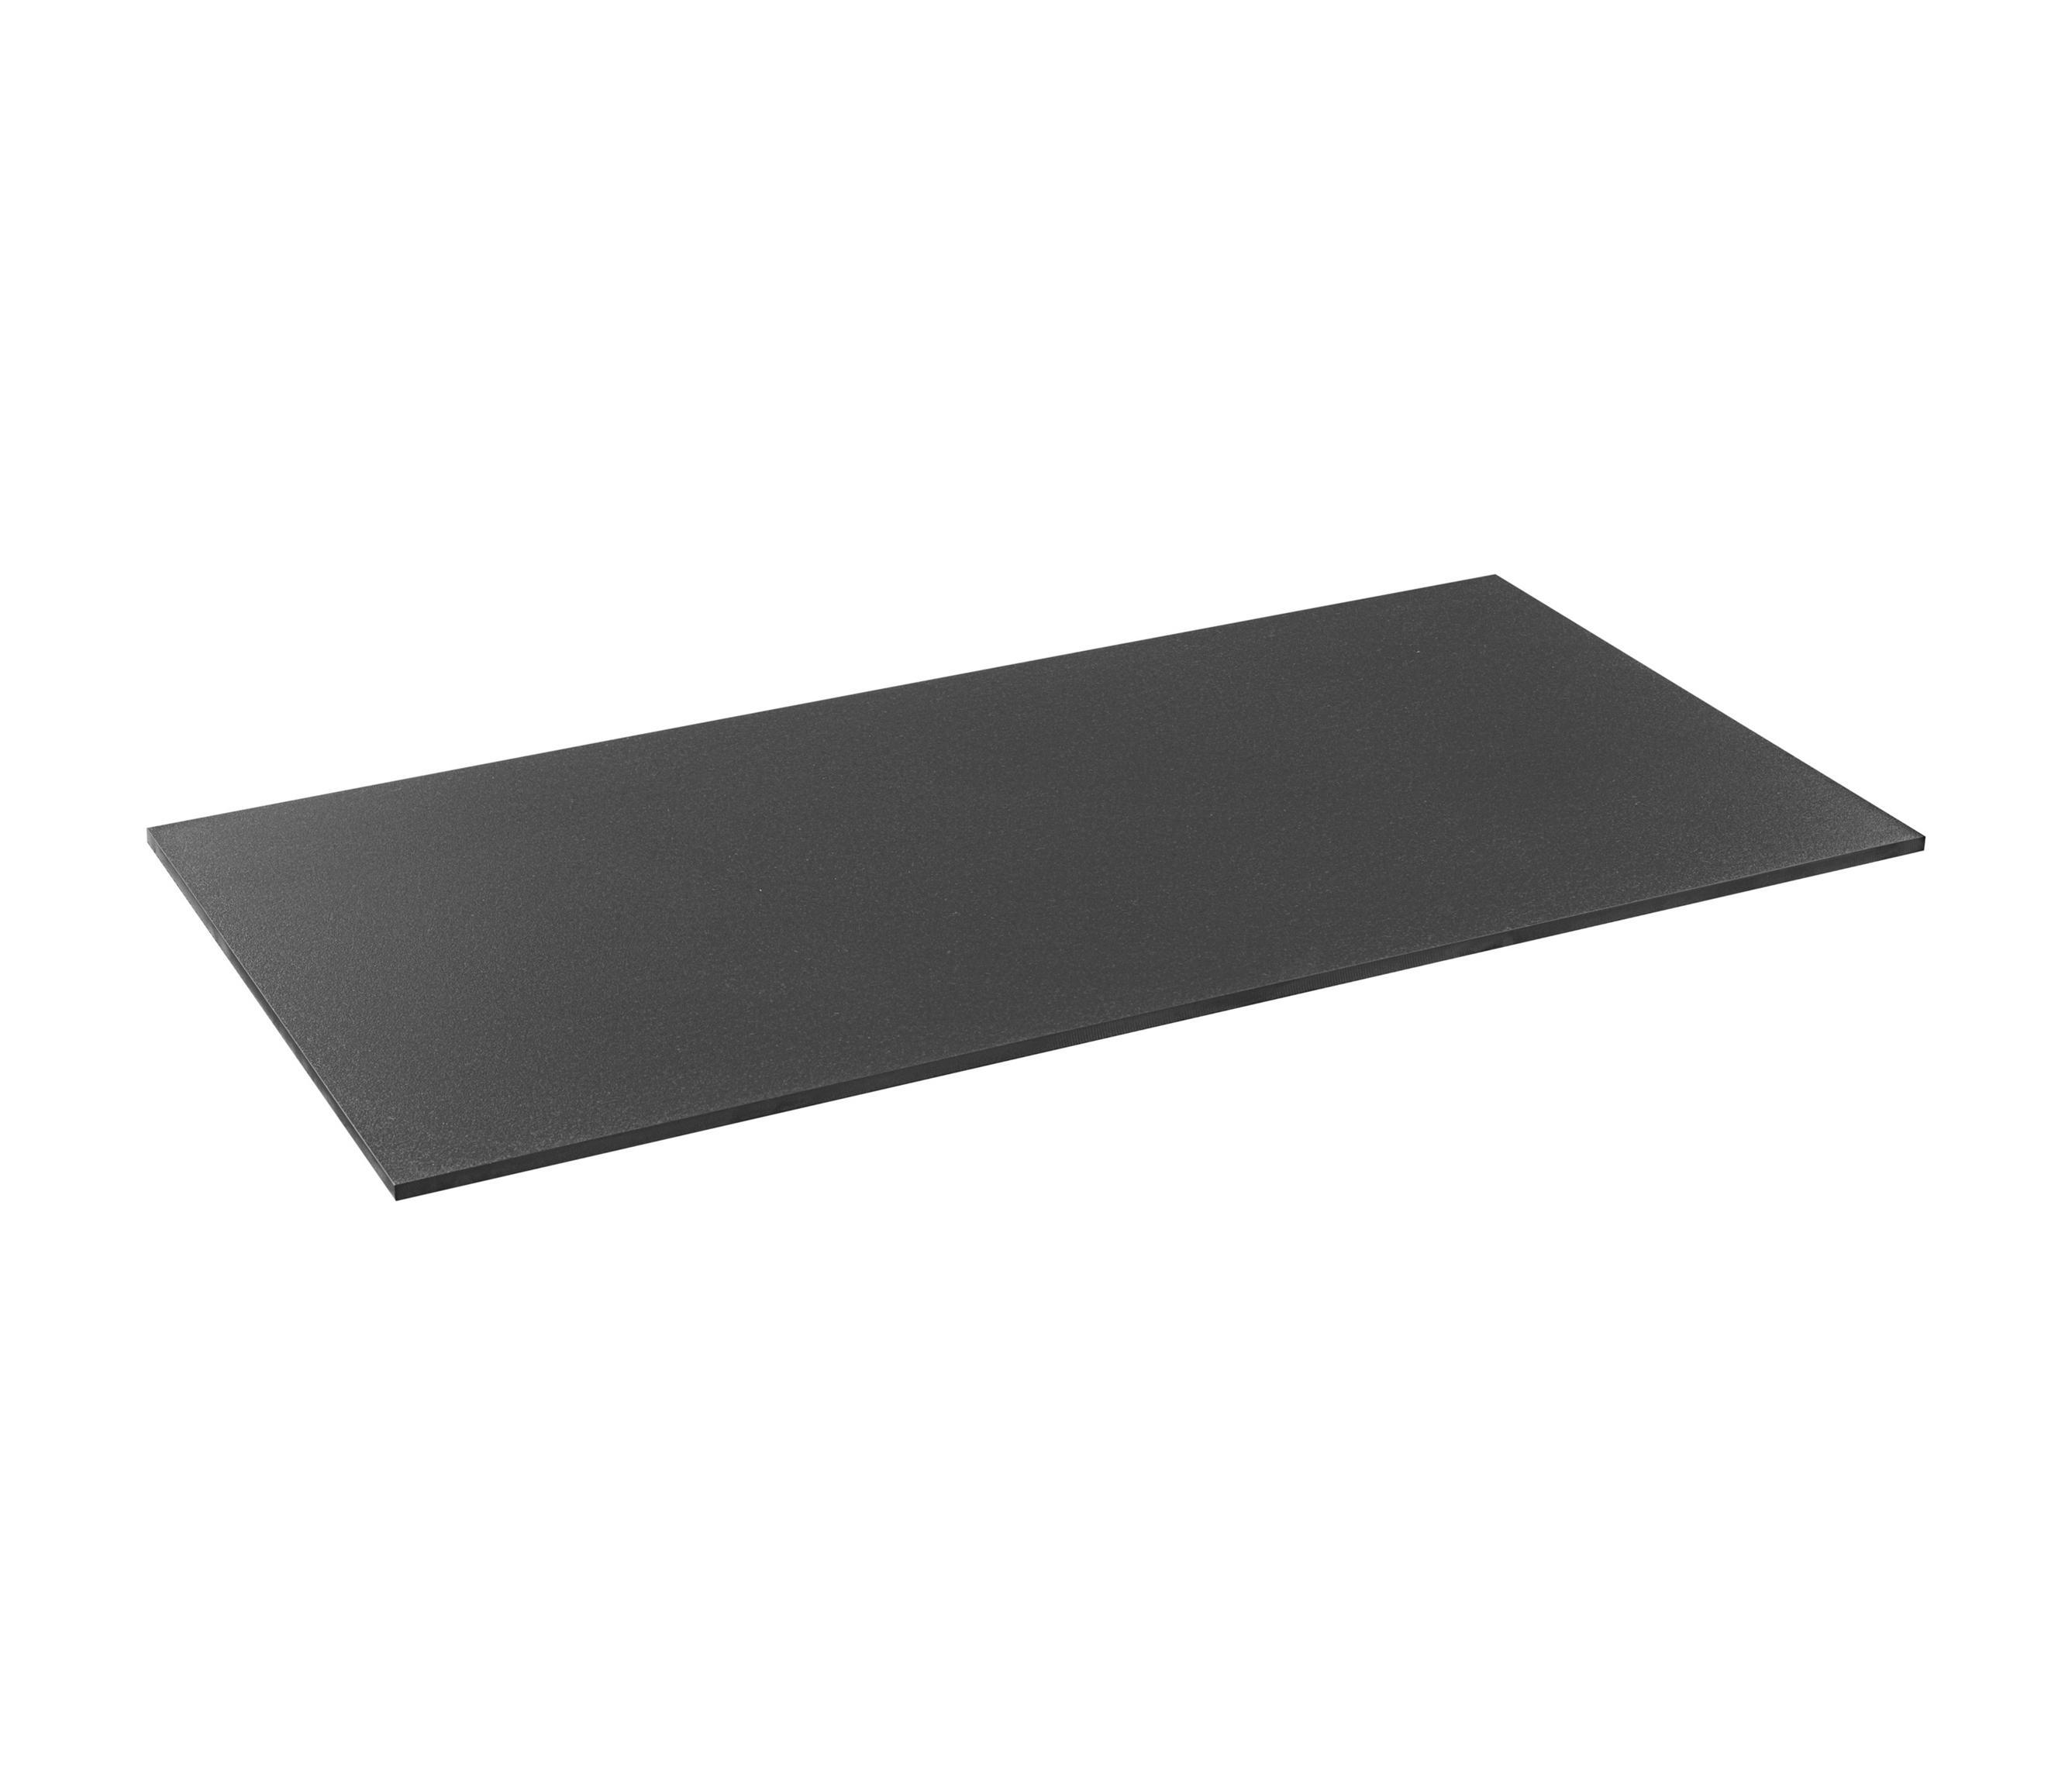 Pavimento nero matt placas de suelo de armani roca for Distribuidor roca barcelona